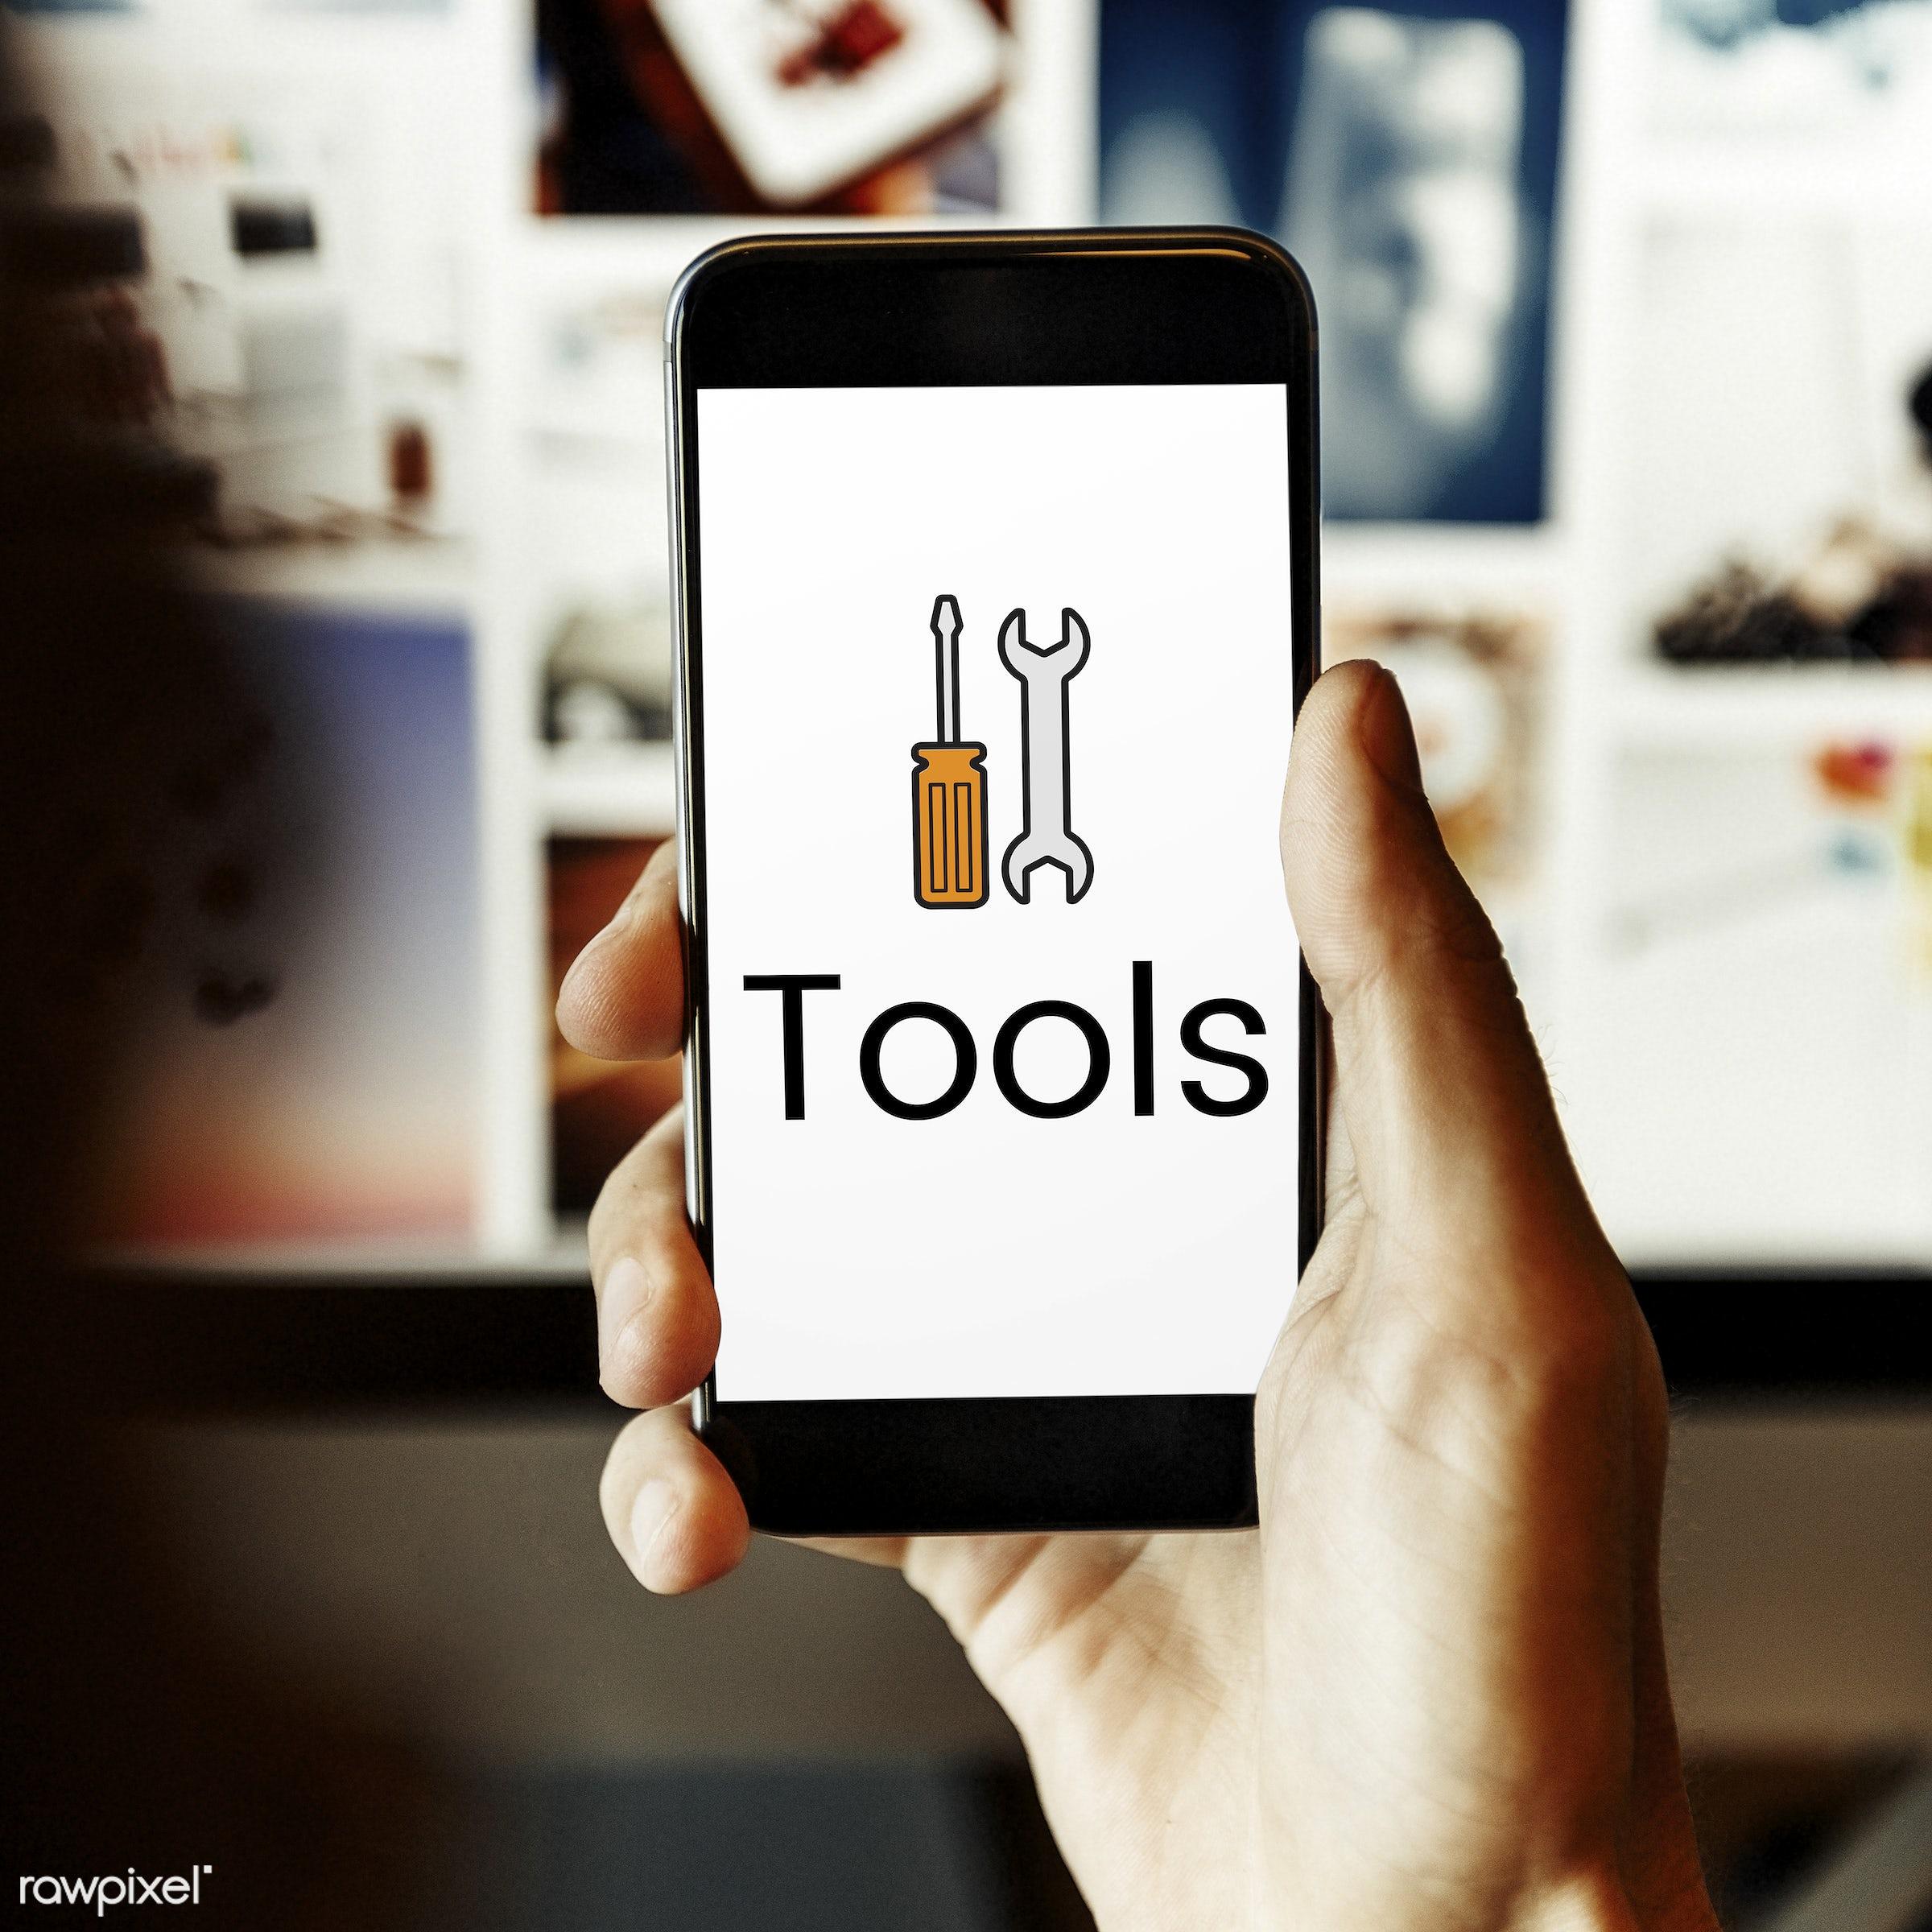 blog, browsing, communication, connect, digital device, element, equipment, graphic, handyman, hardware, icon, instruments,...